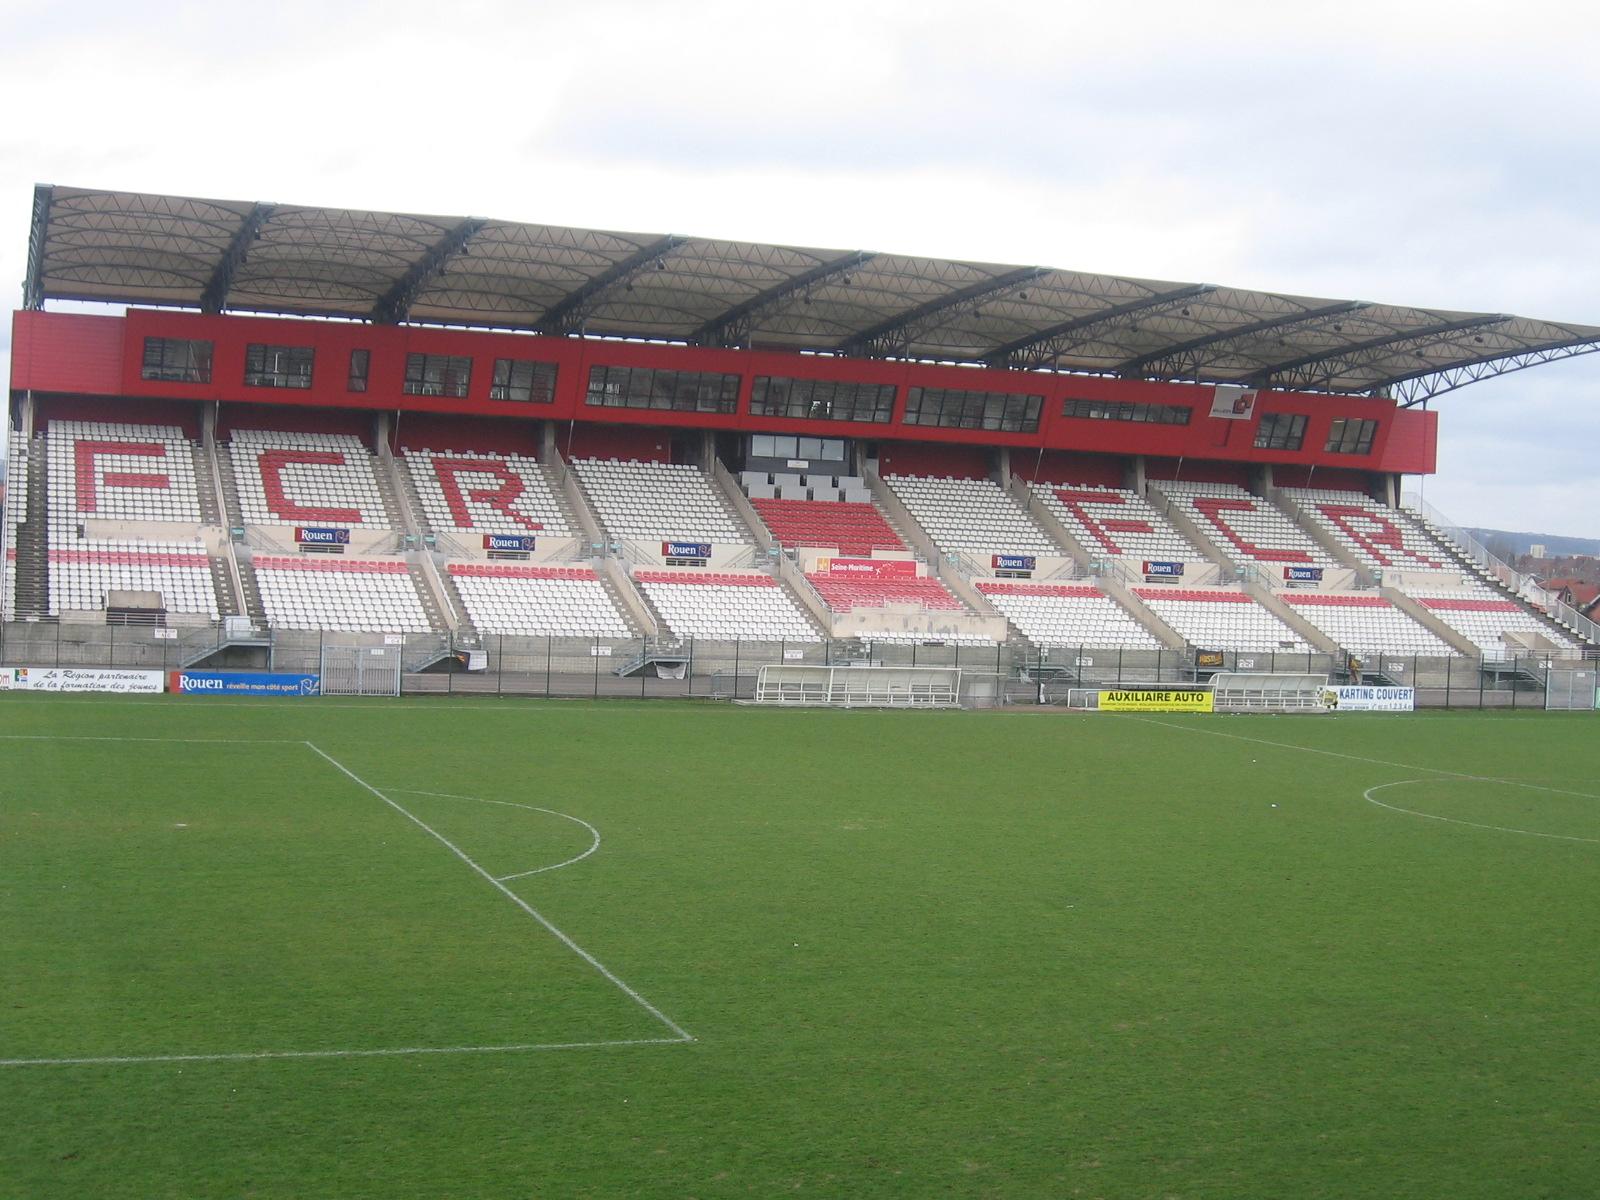 FC Rouen Stade-robert-diochon-rouen-2